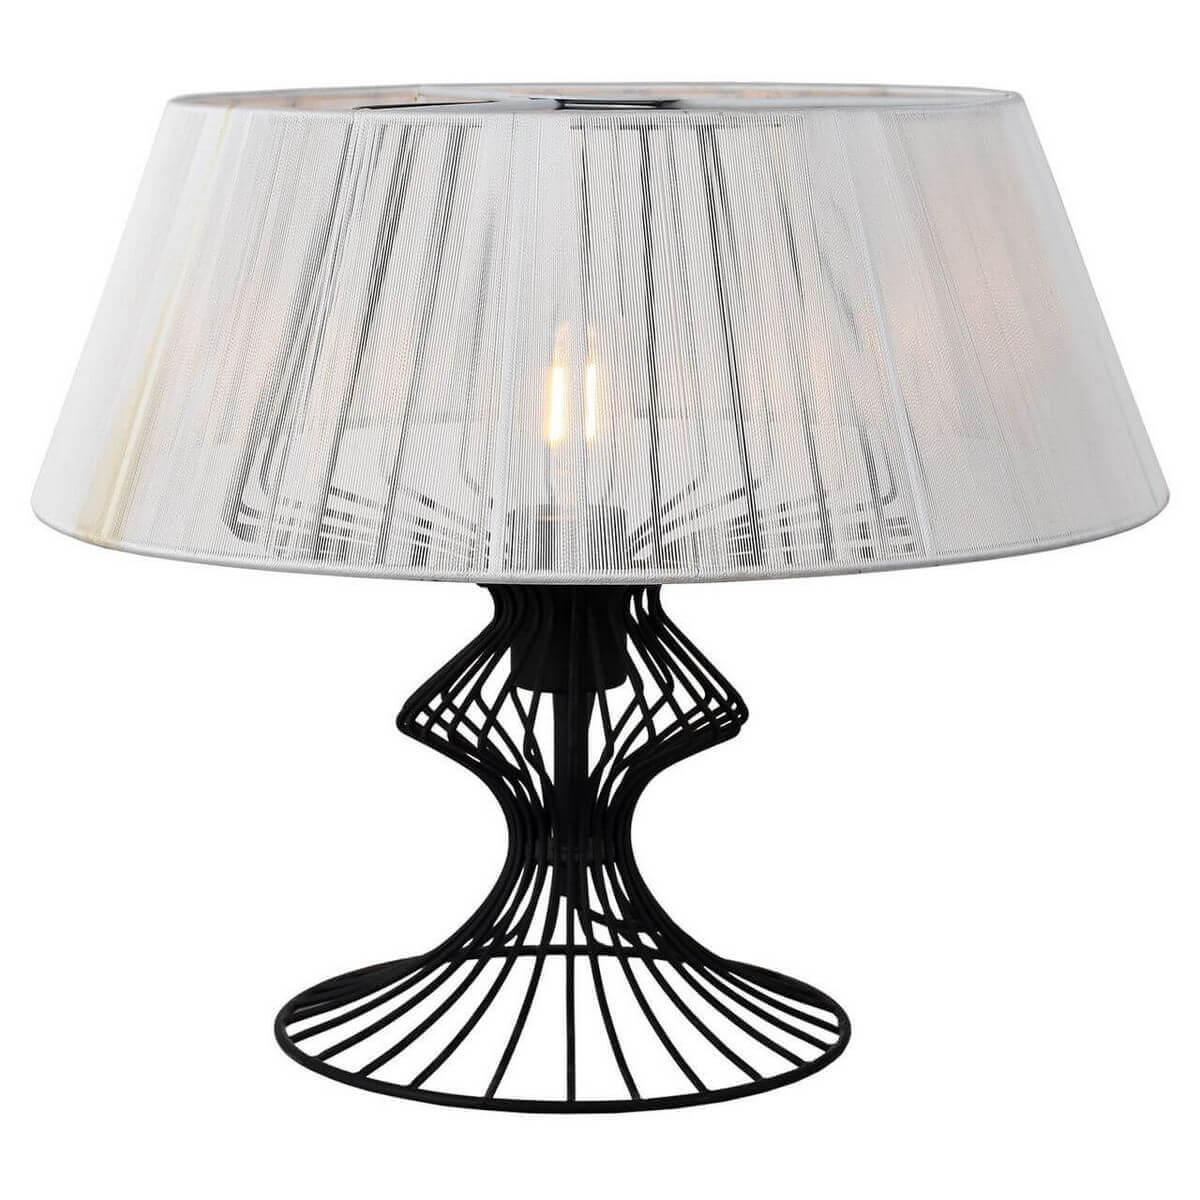 цена Настольная лампа Lussole Loft Cameron LSP-0528 онлайн в 2017 году